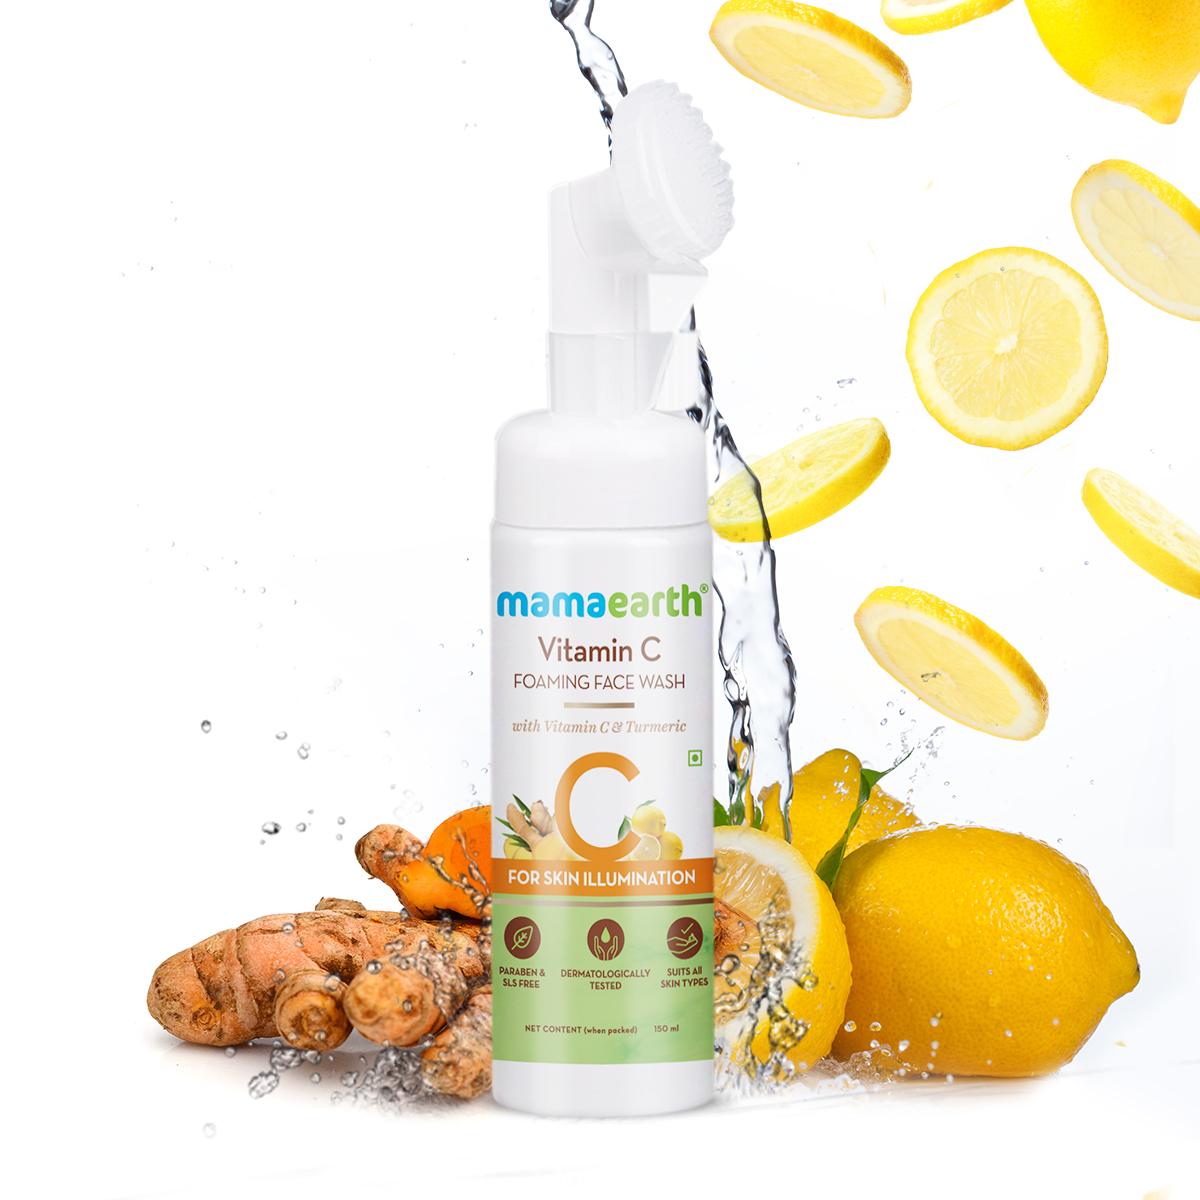 mamaearth Vitamin C Foaming Face Wash